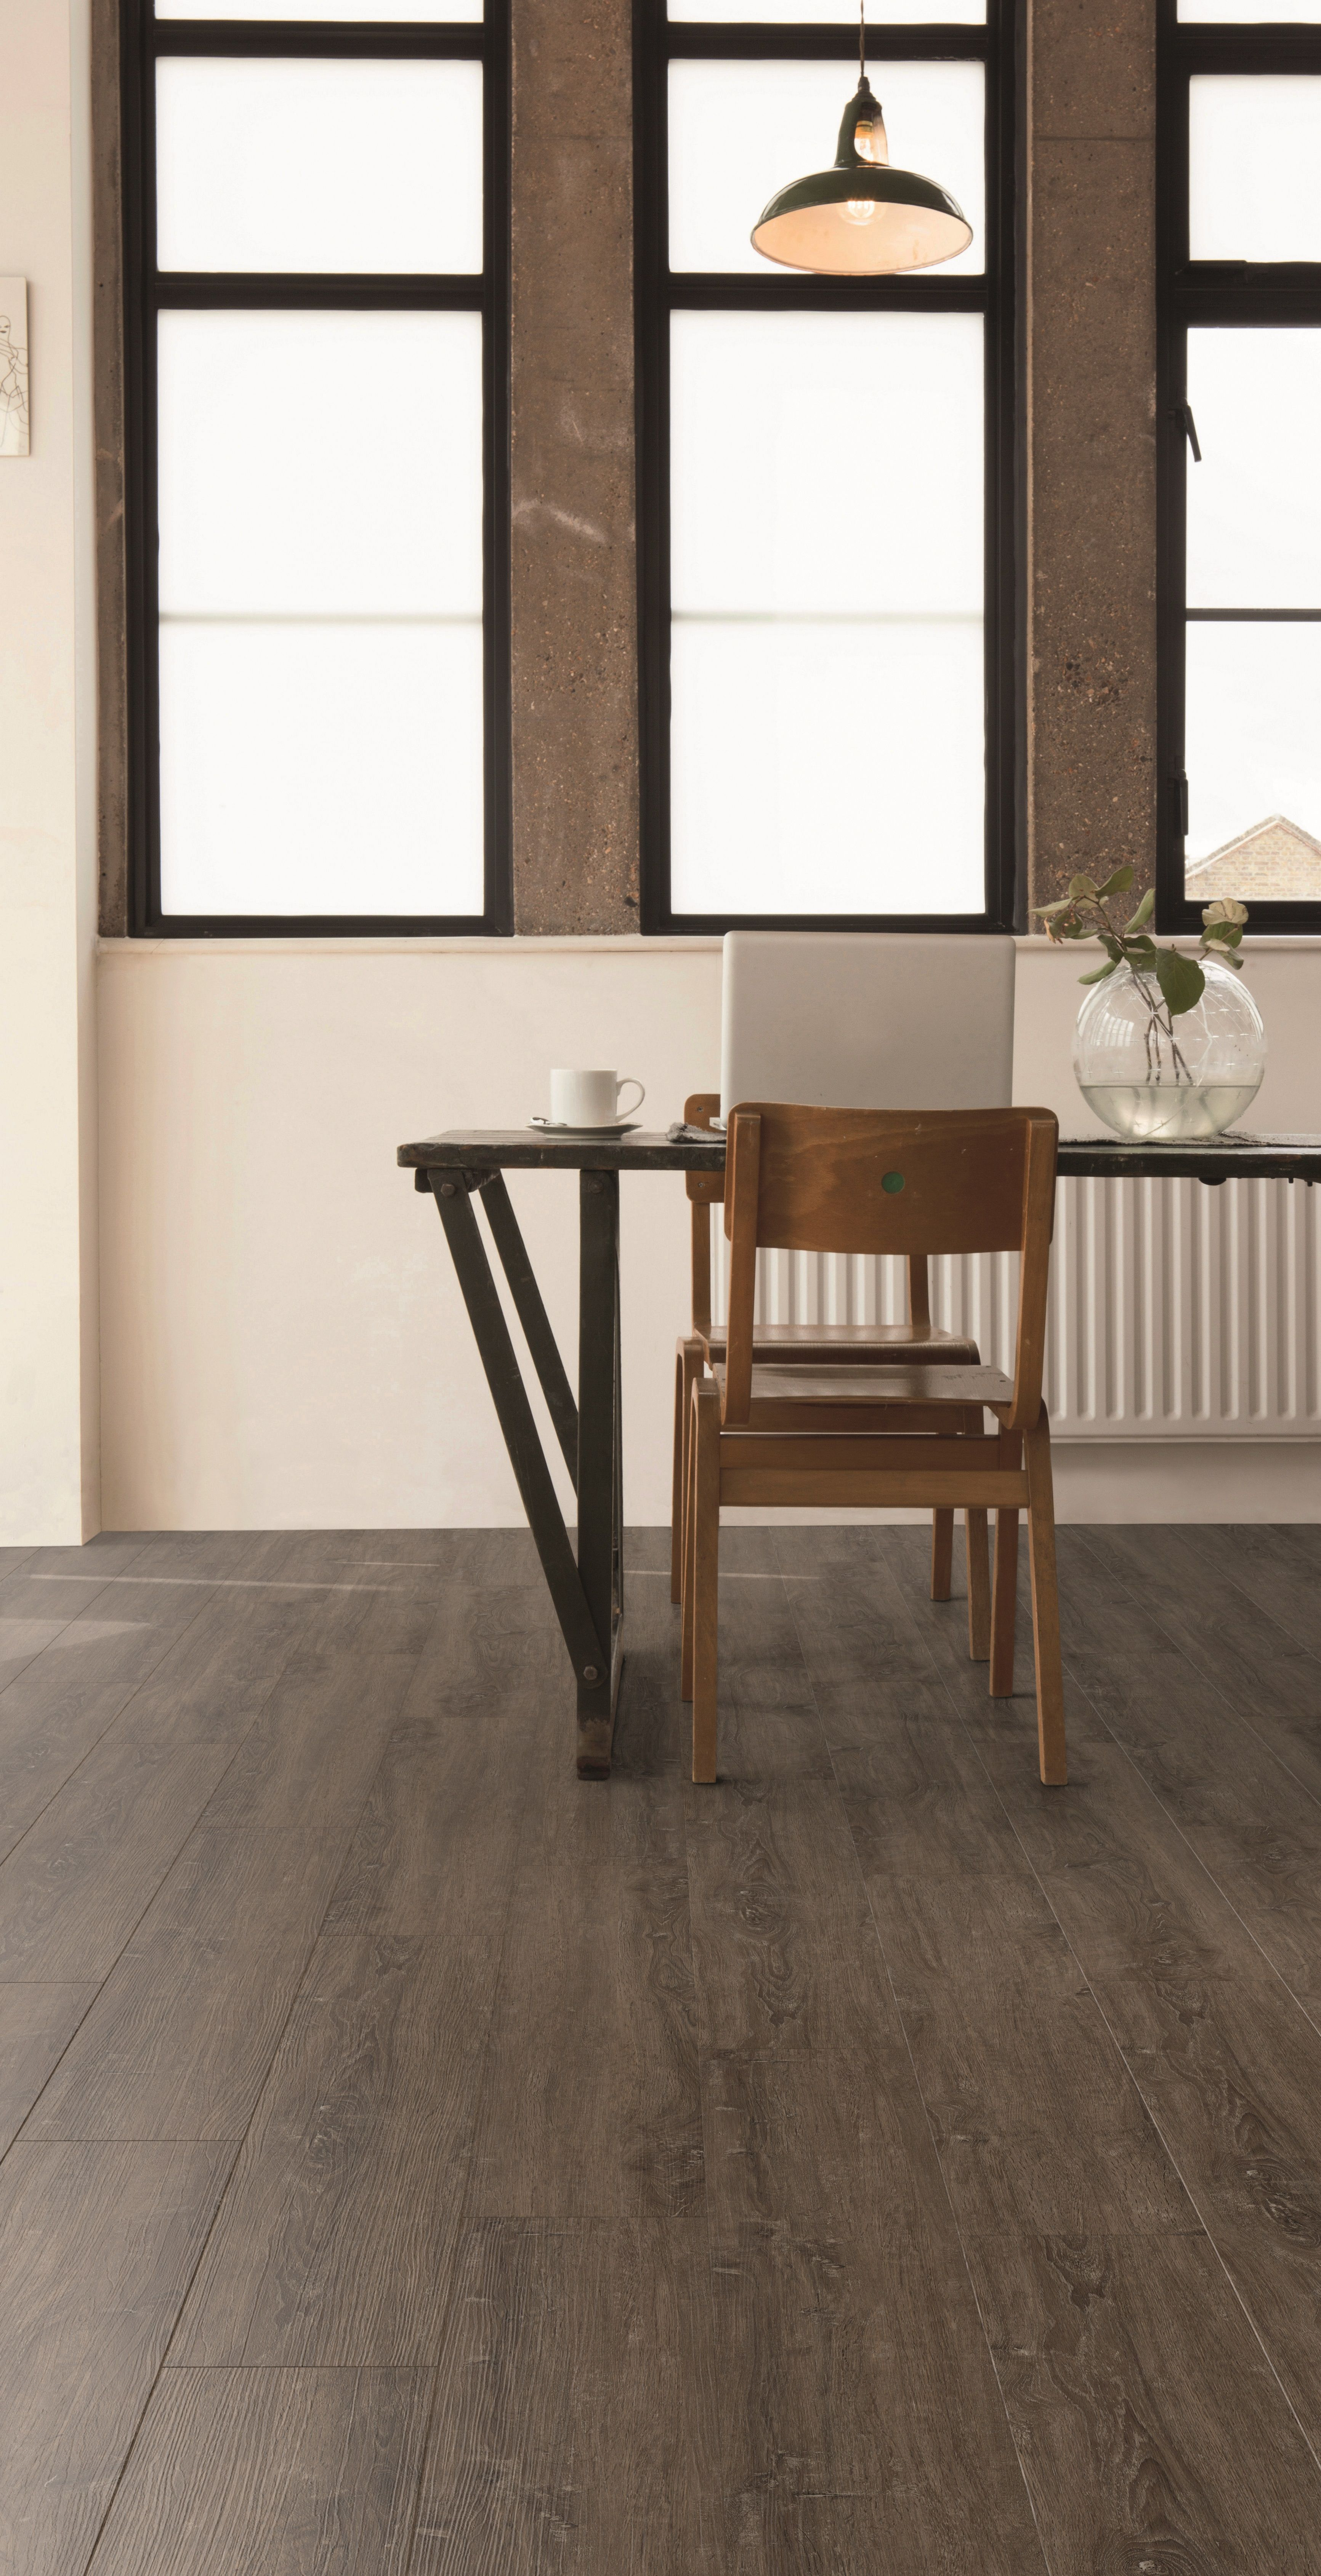 Fusion Flooring 1069 Willow Brown Oak Dining Design Flooring Kitchen Flooring